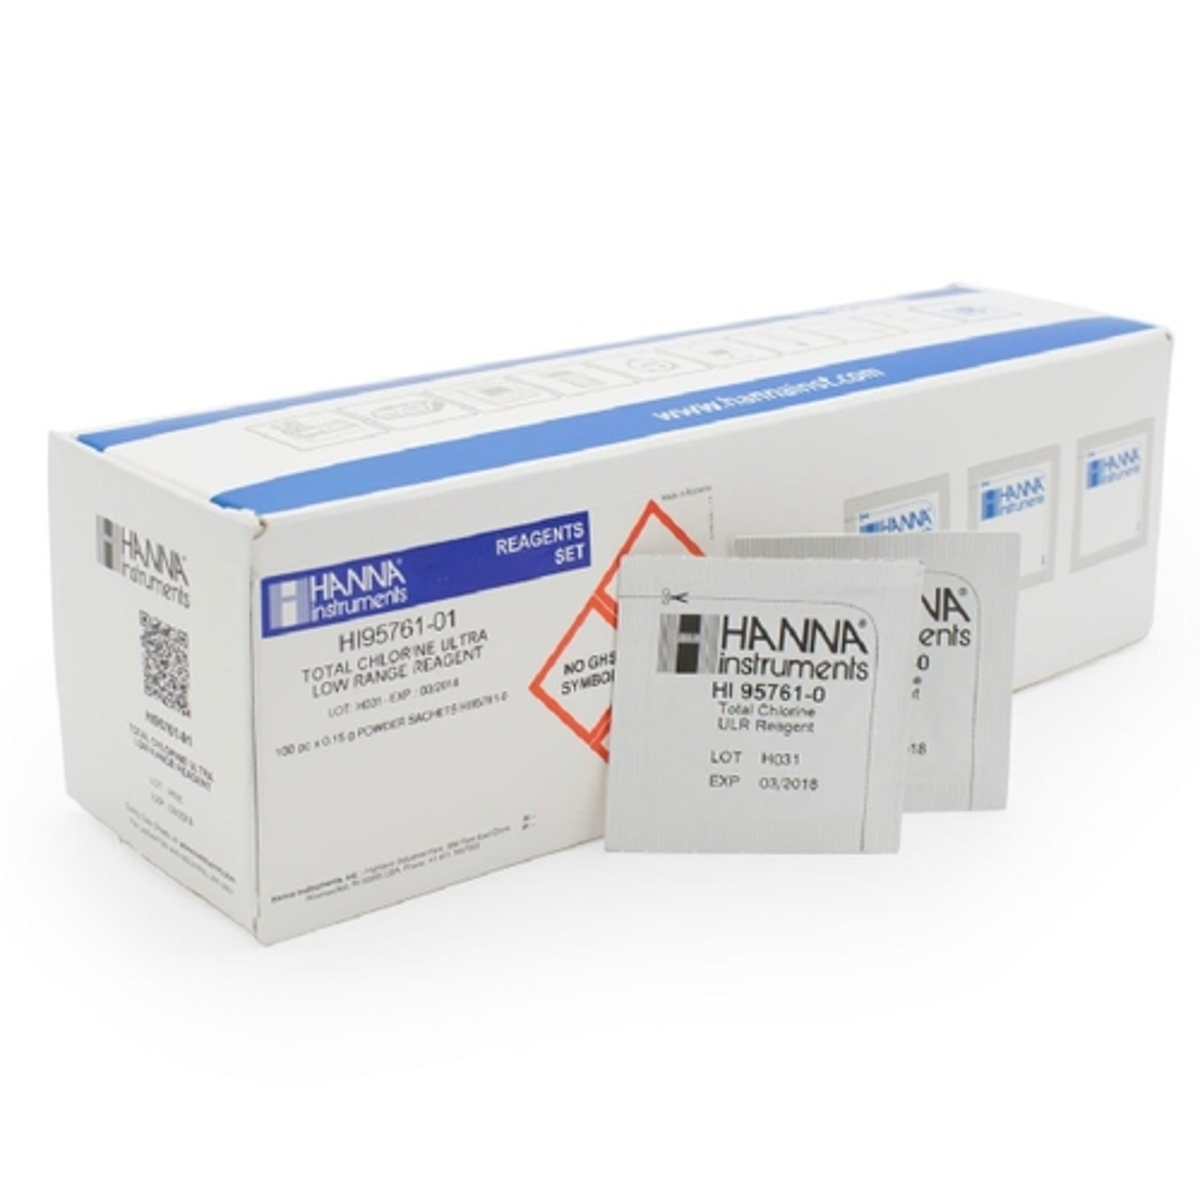 Reagenti cloro totale scala ultra bassa (100 analisi) - HI95761-01